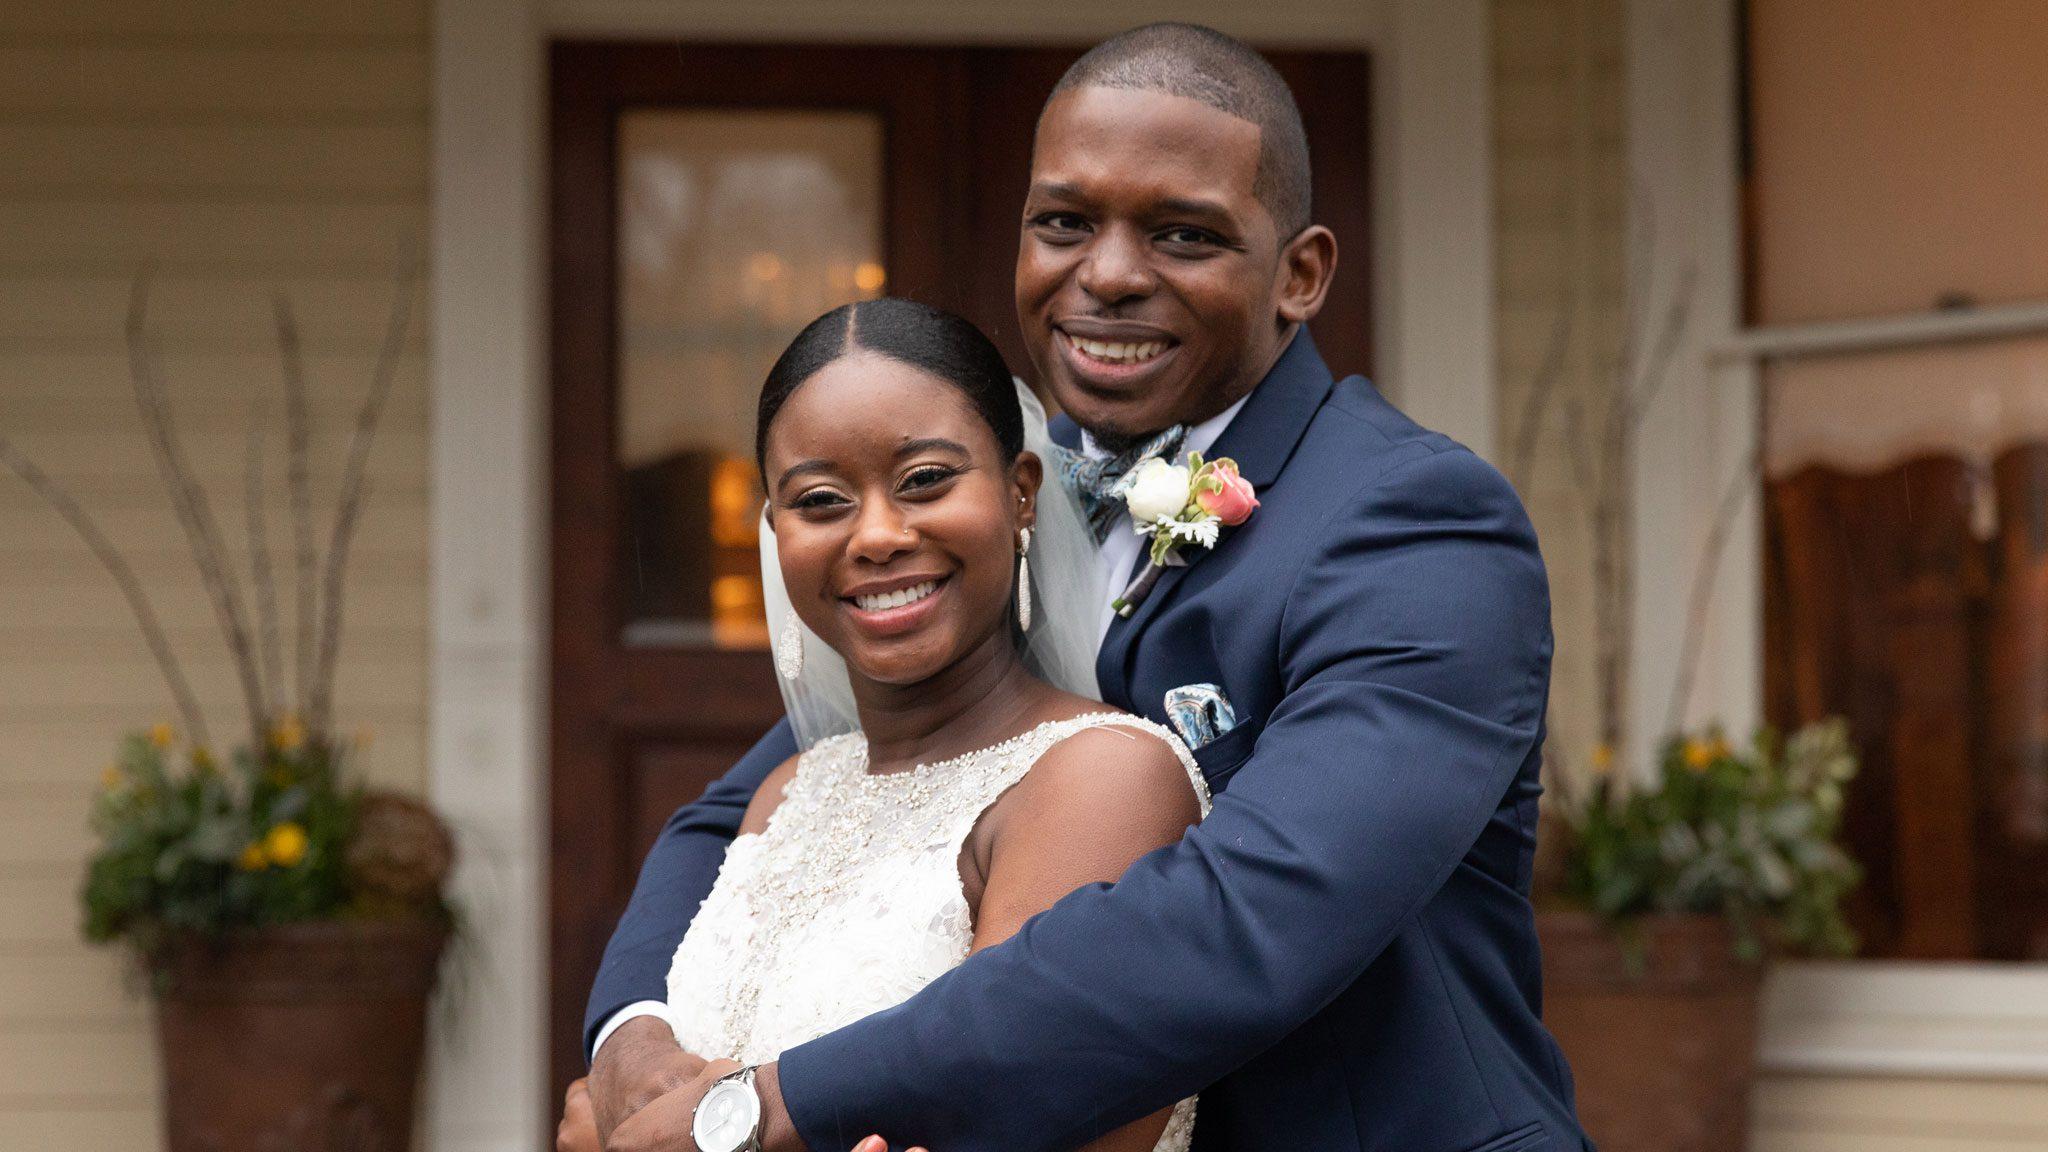 Greg Okotie and Deonna McNeill